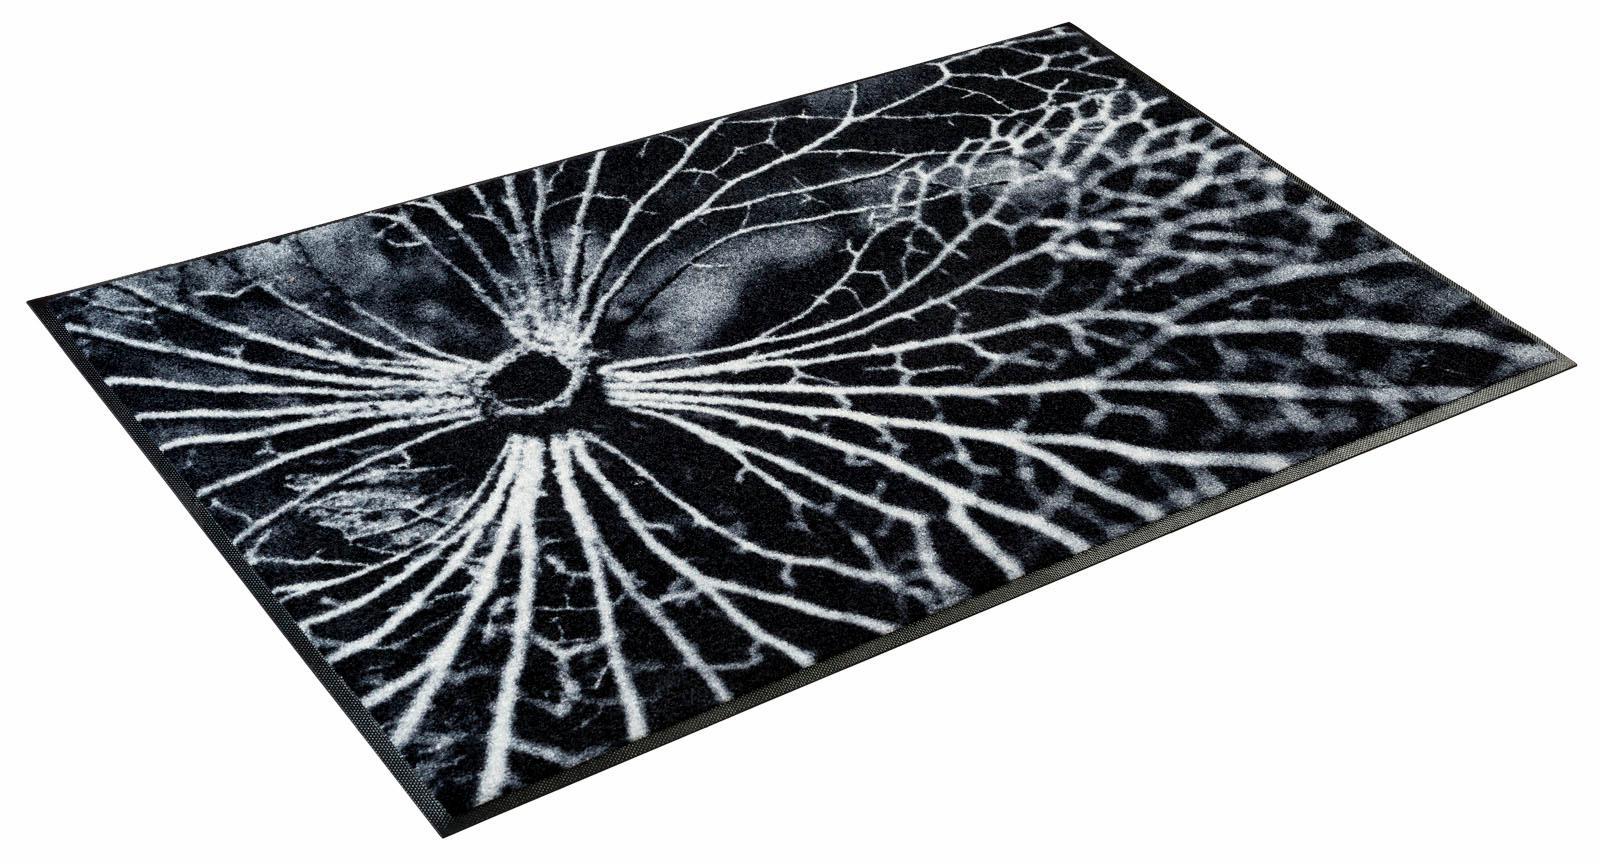 Läufer Soft Shell wash+dry by Kleen-Tex rechteckig Höhe 7 mm gedruckt